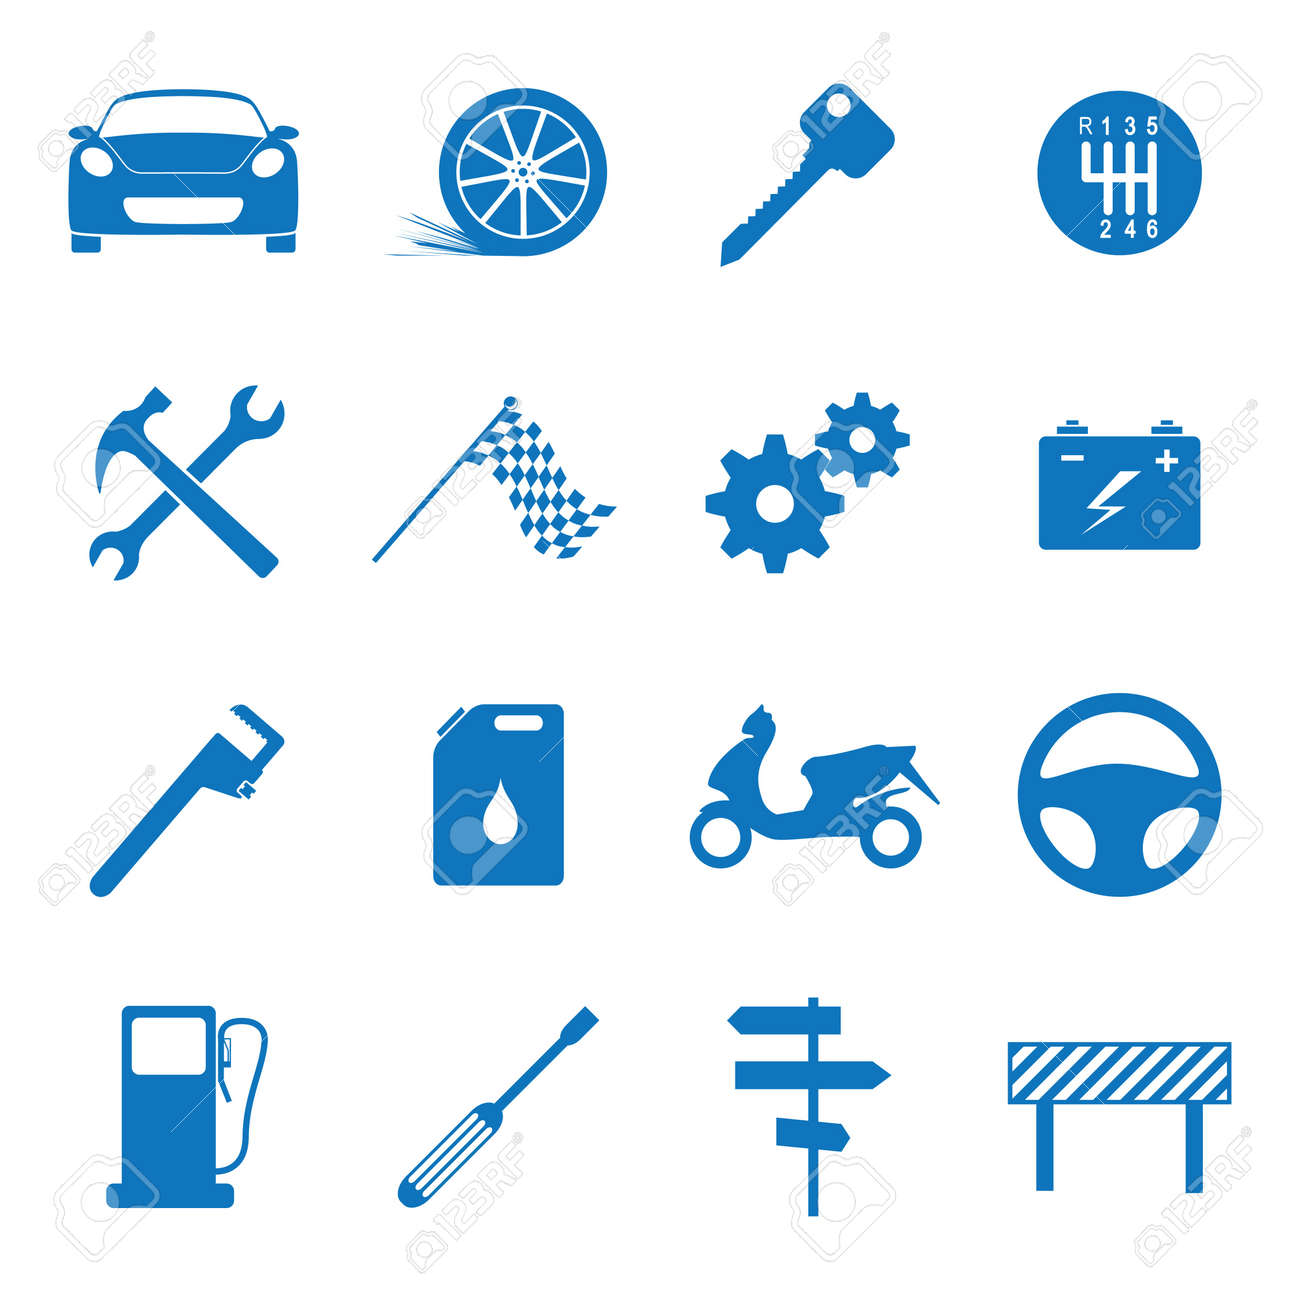 Vector illustration icons on the mechanics Stock Vector - 12792925